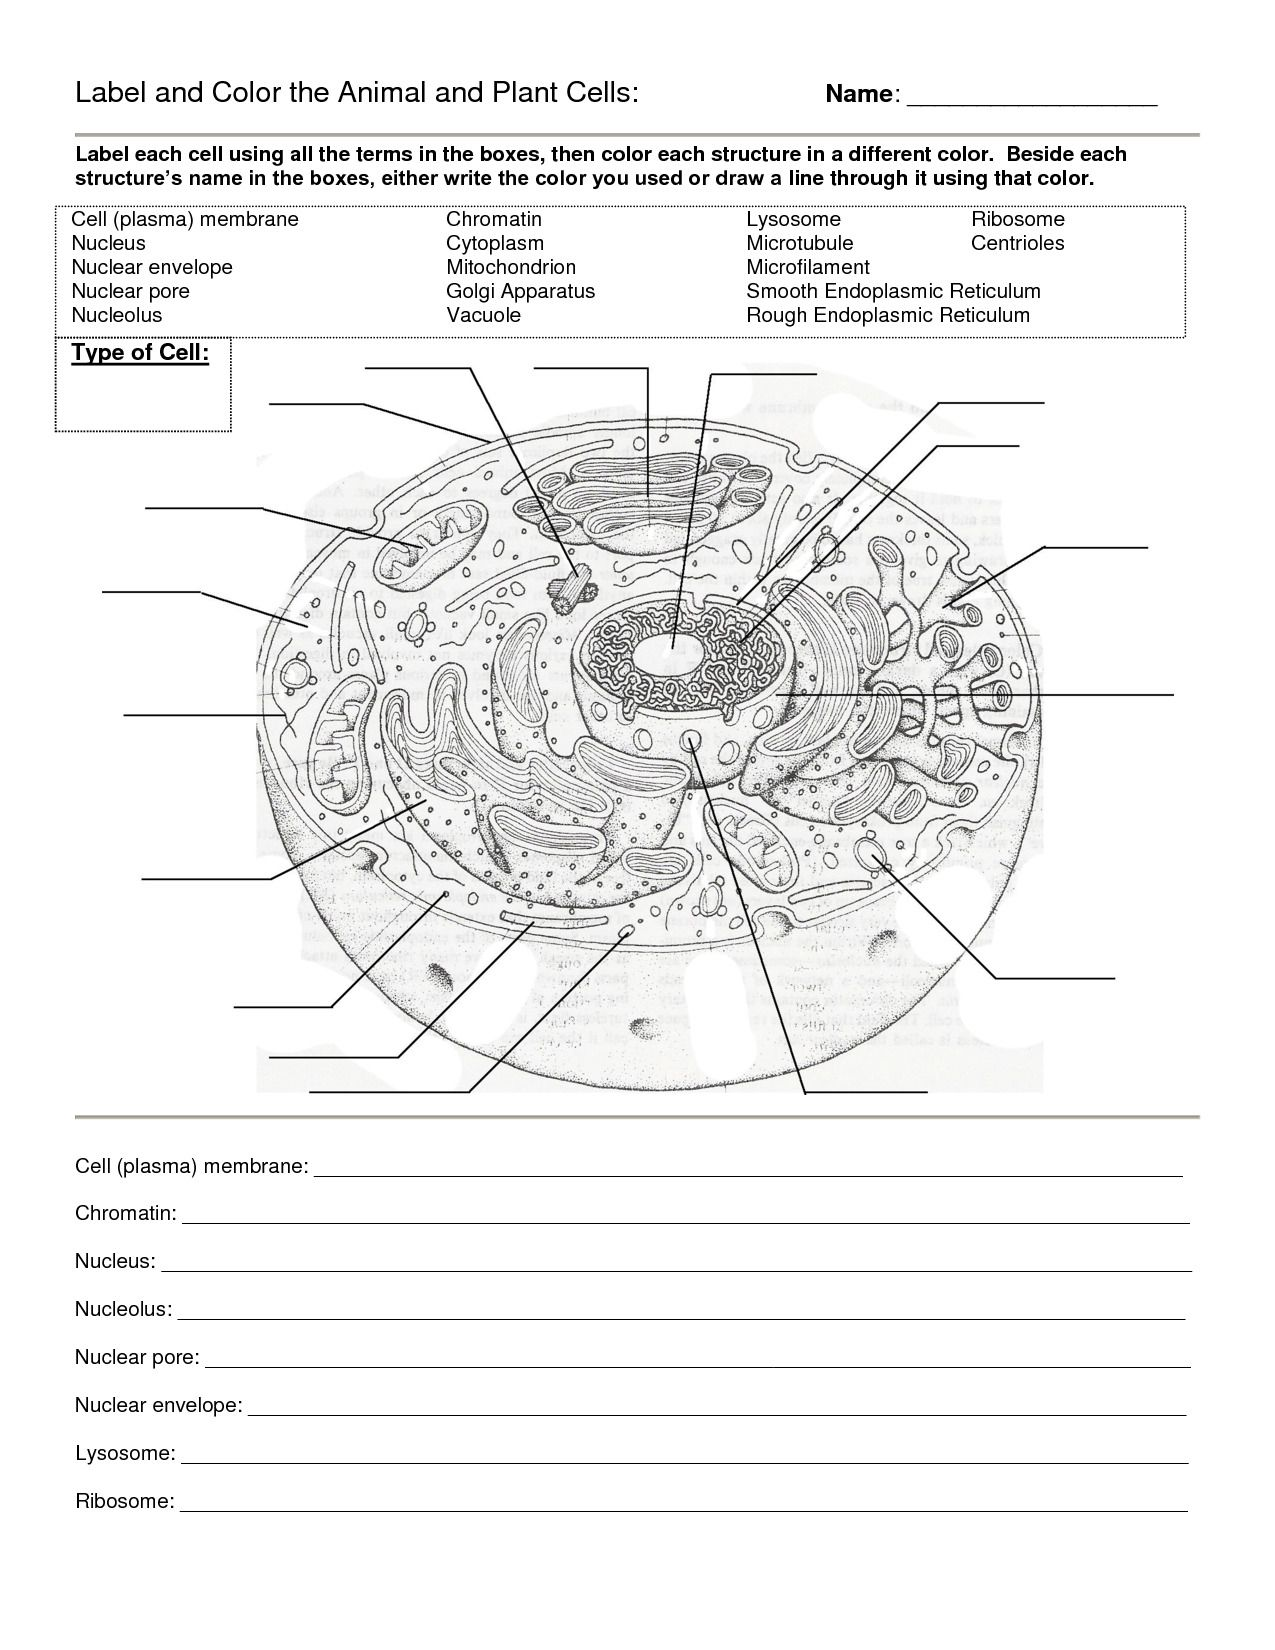 Prokaryotic And Eukaryotic Cells Worksheet